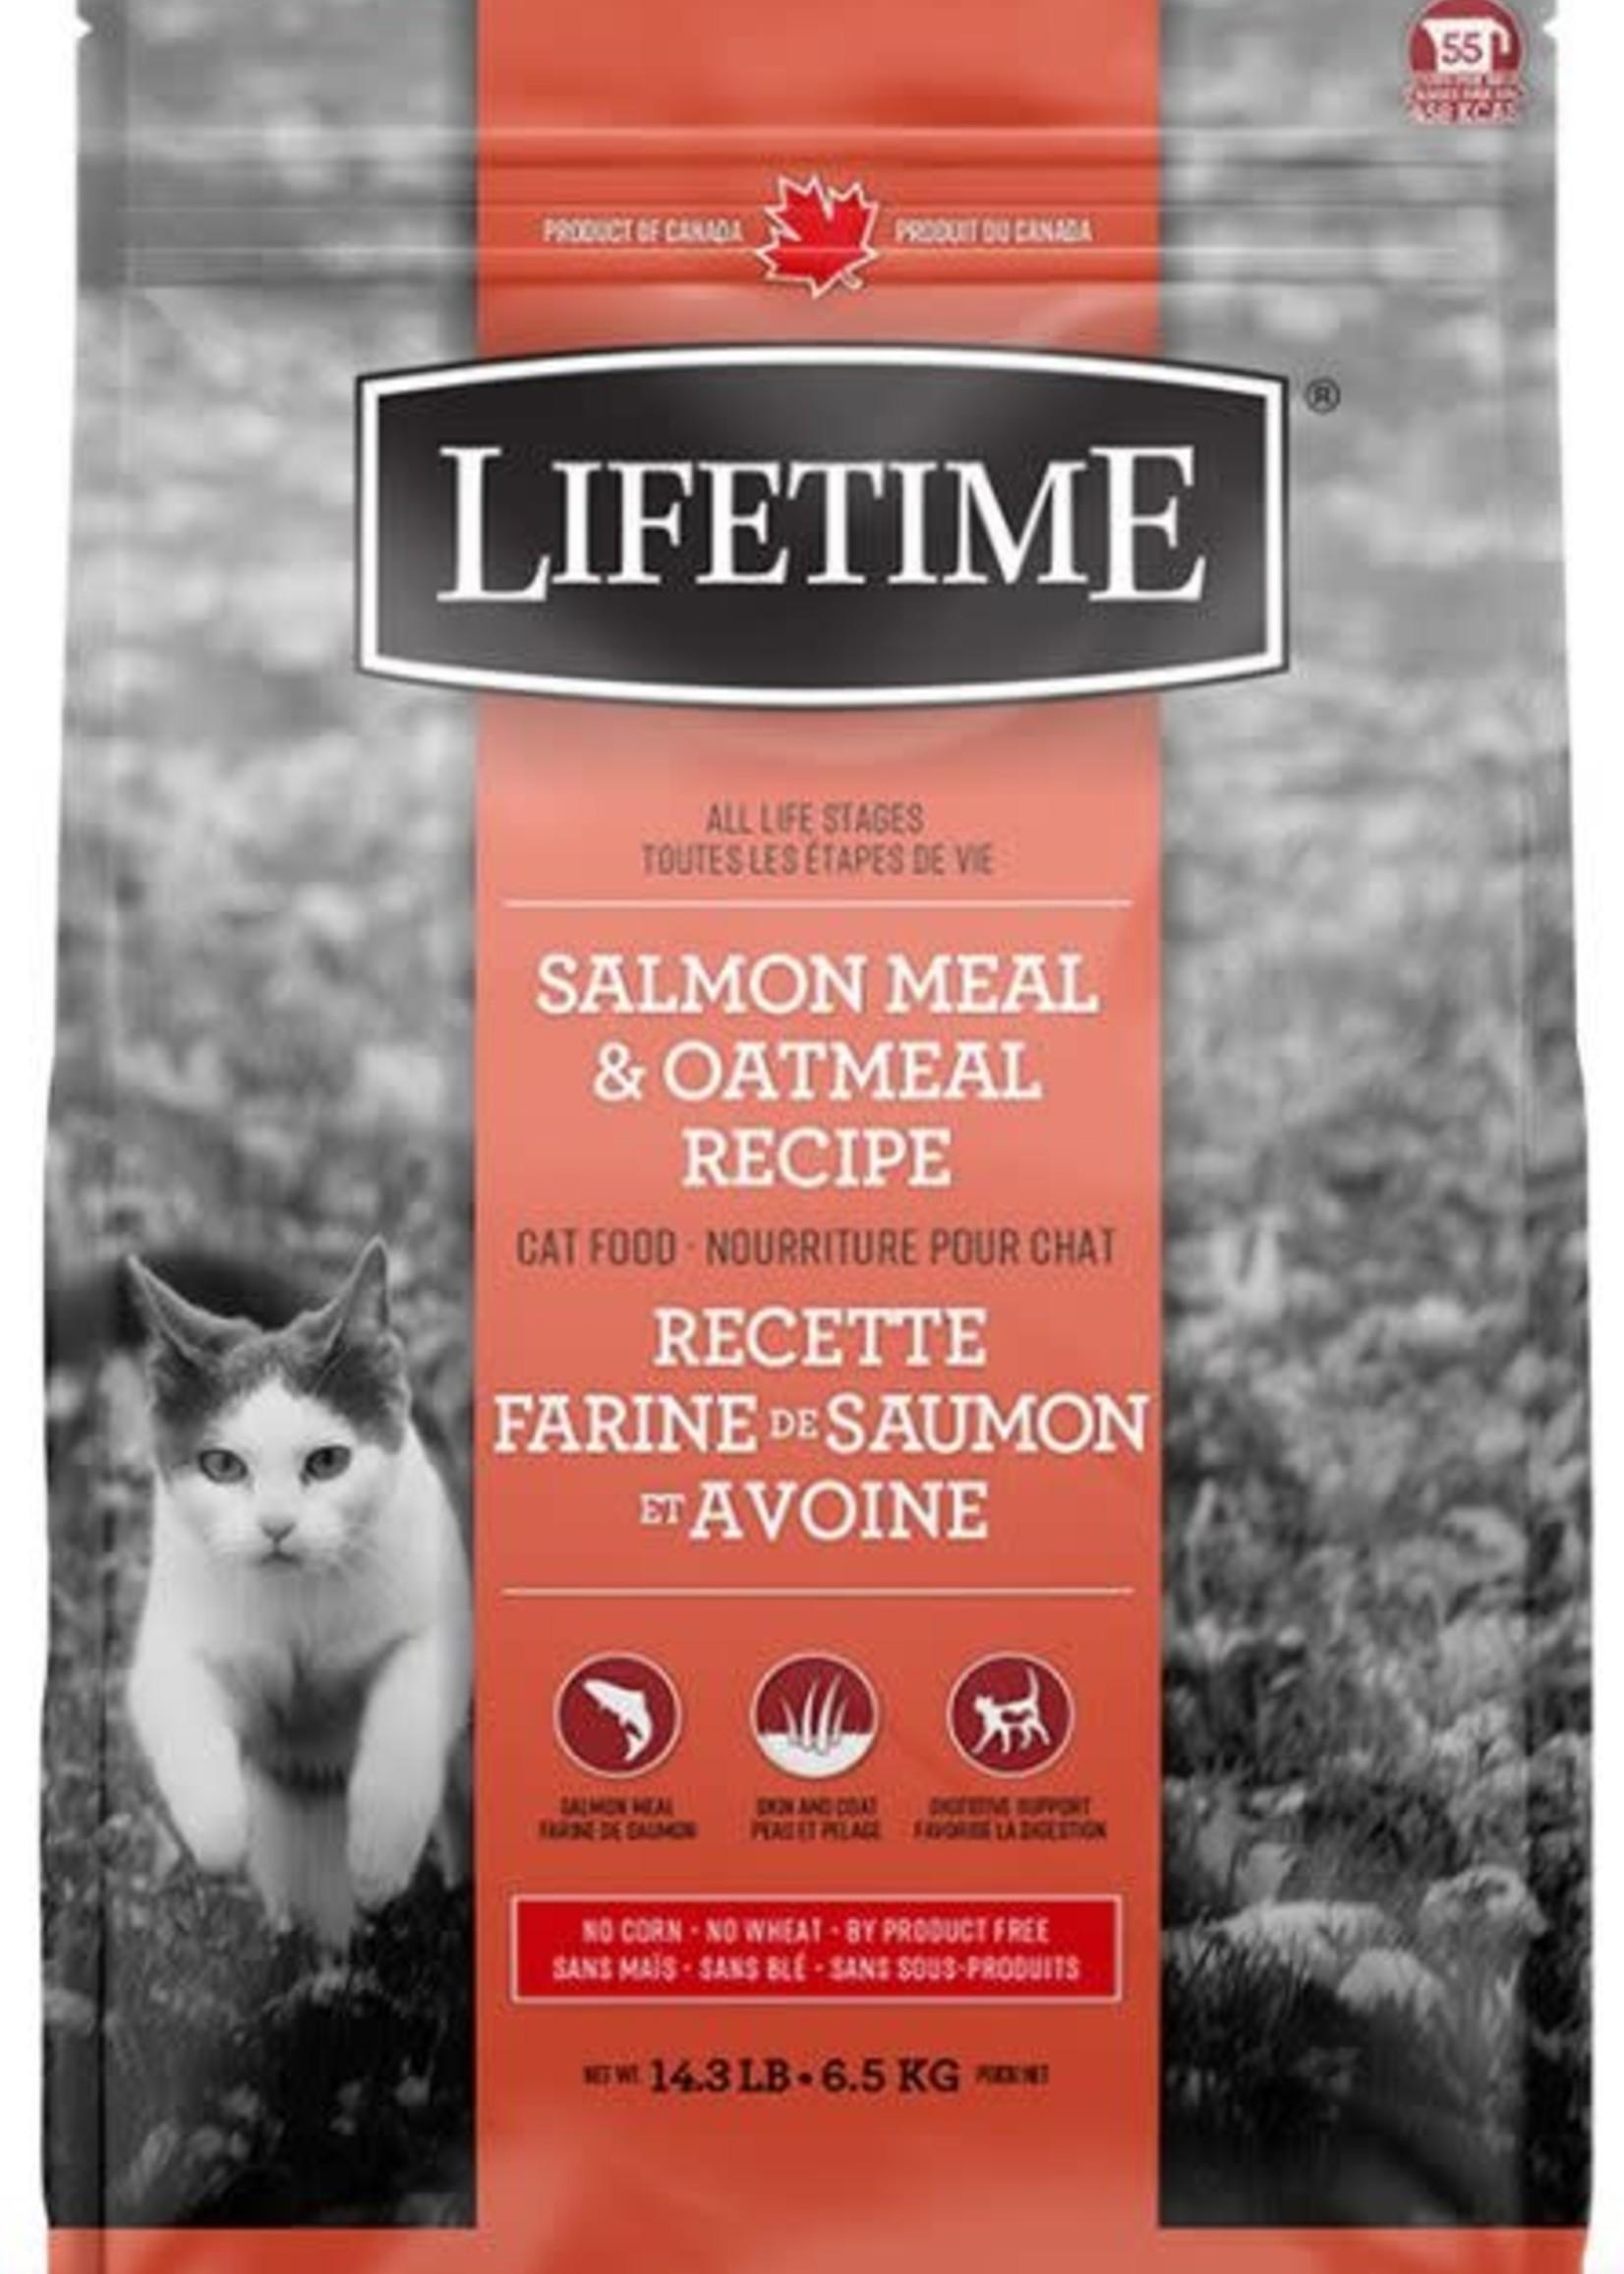 LifeTime® Lifetime Salmon Meal & Oatmeal Recipe 14lbs